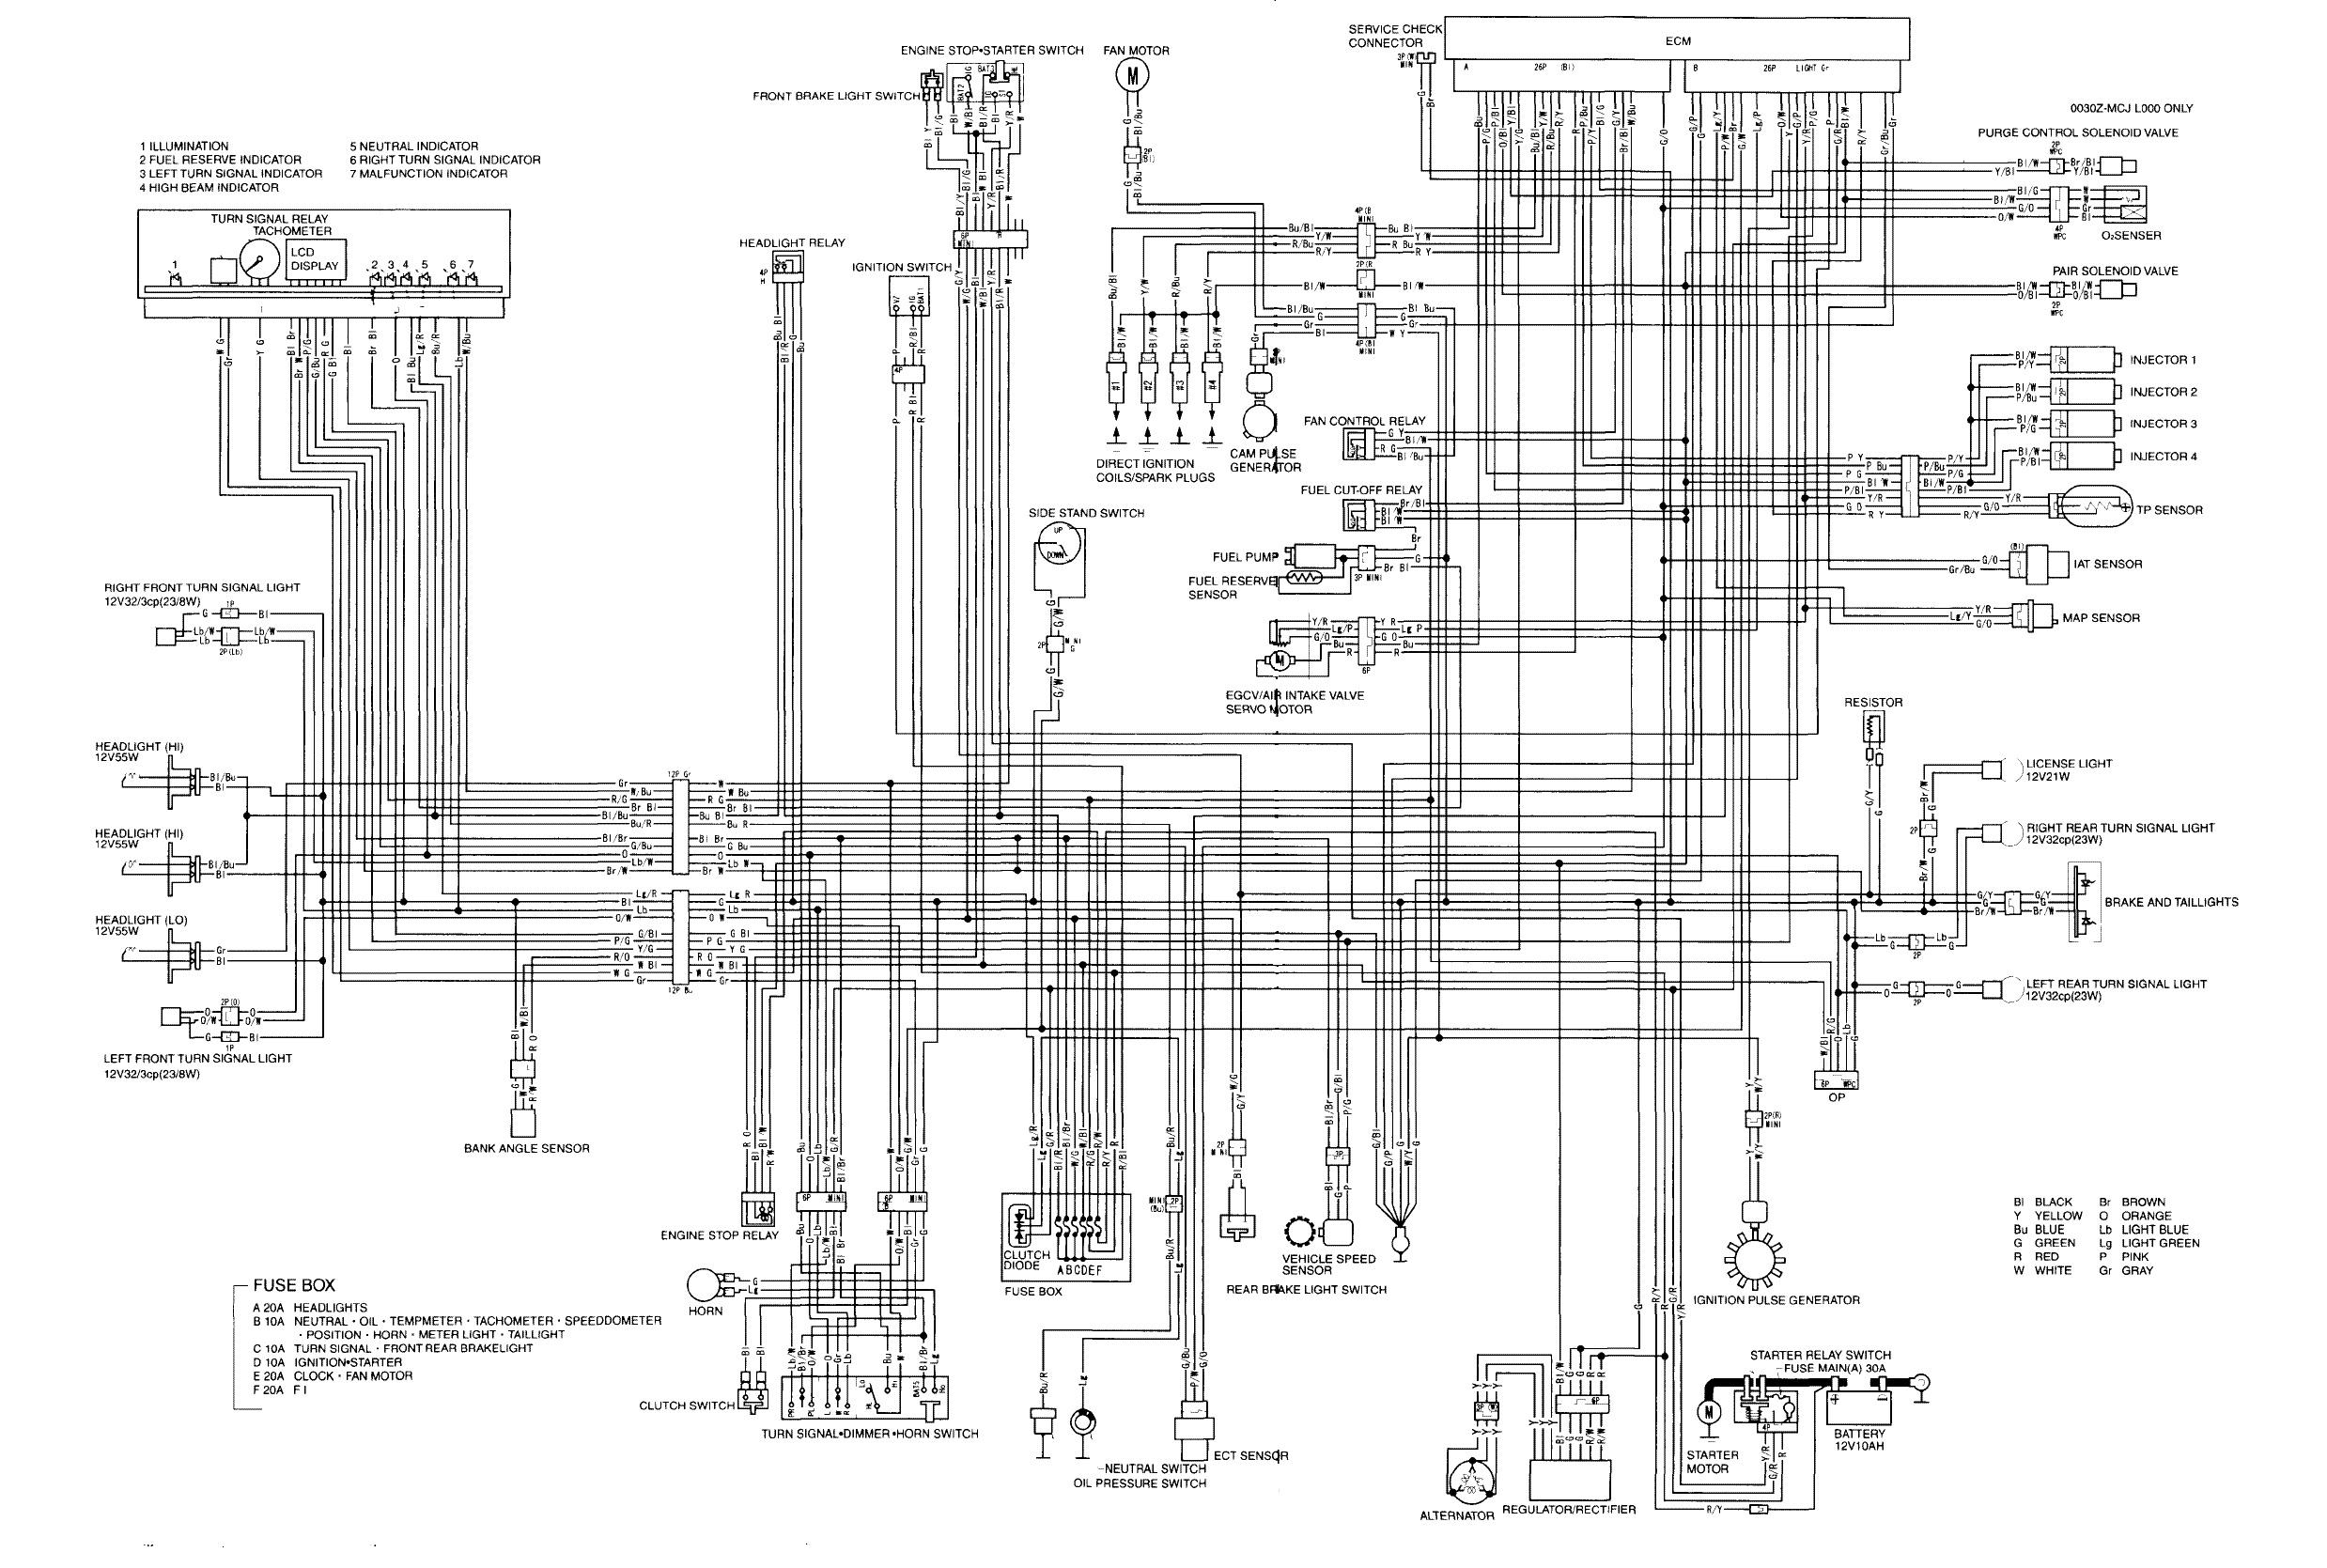 2005 cbr600rr wiring diagram 2006 cbr600rr wiring diagram 2006 image wiring diagram 2006 cbr600rr wiring diagram 2006 auto wiring diagram